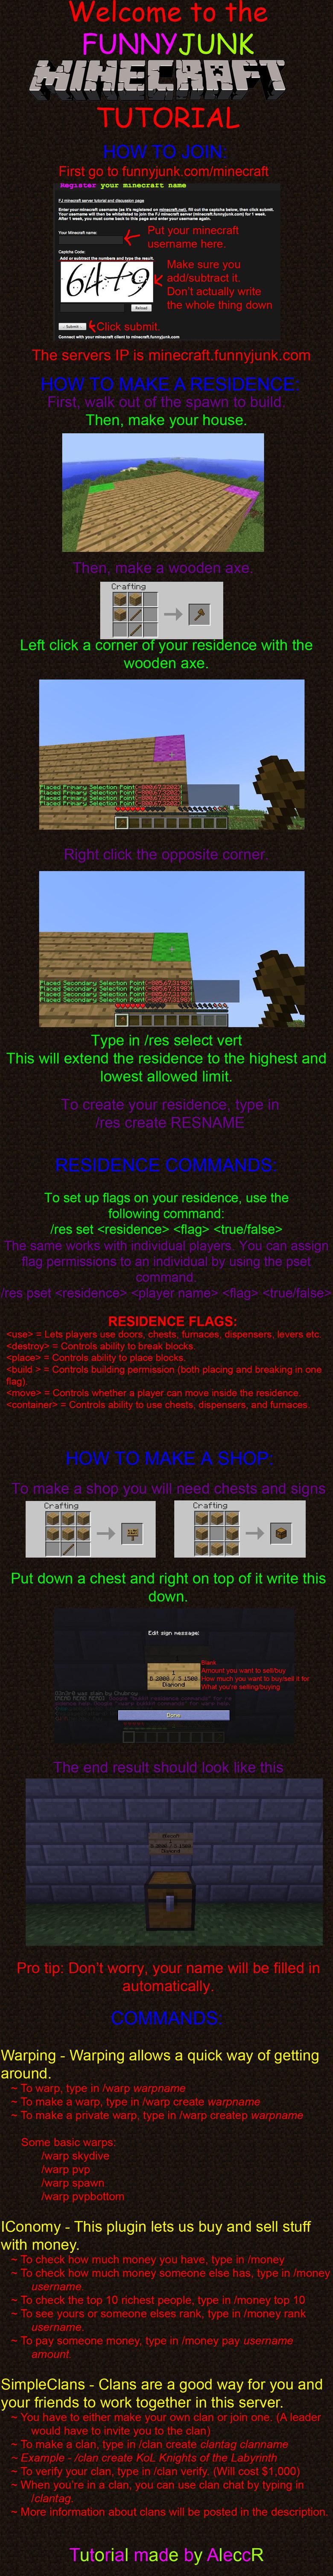 MINECRAFT FUNNYJUNK TUTORIAL. Residence Plugin: residencebukkitmod.wikispaces.com/ SimpleClans Plugin: dev.bukkit.org/server-mods/simpleclans/ STOP ASKING STUPI